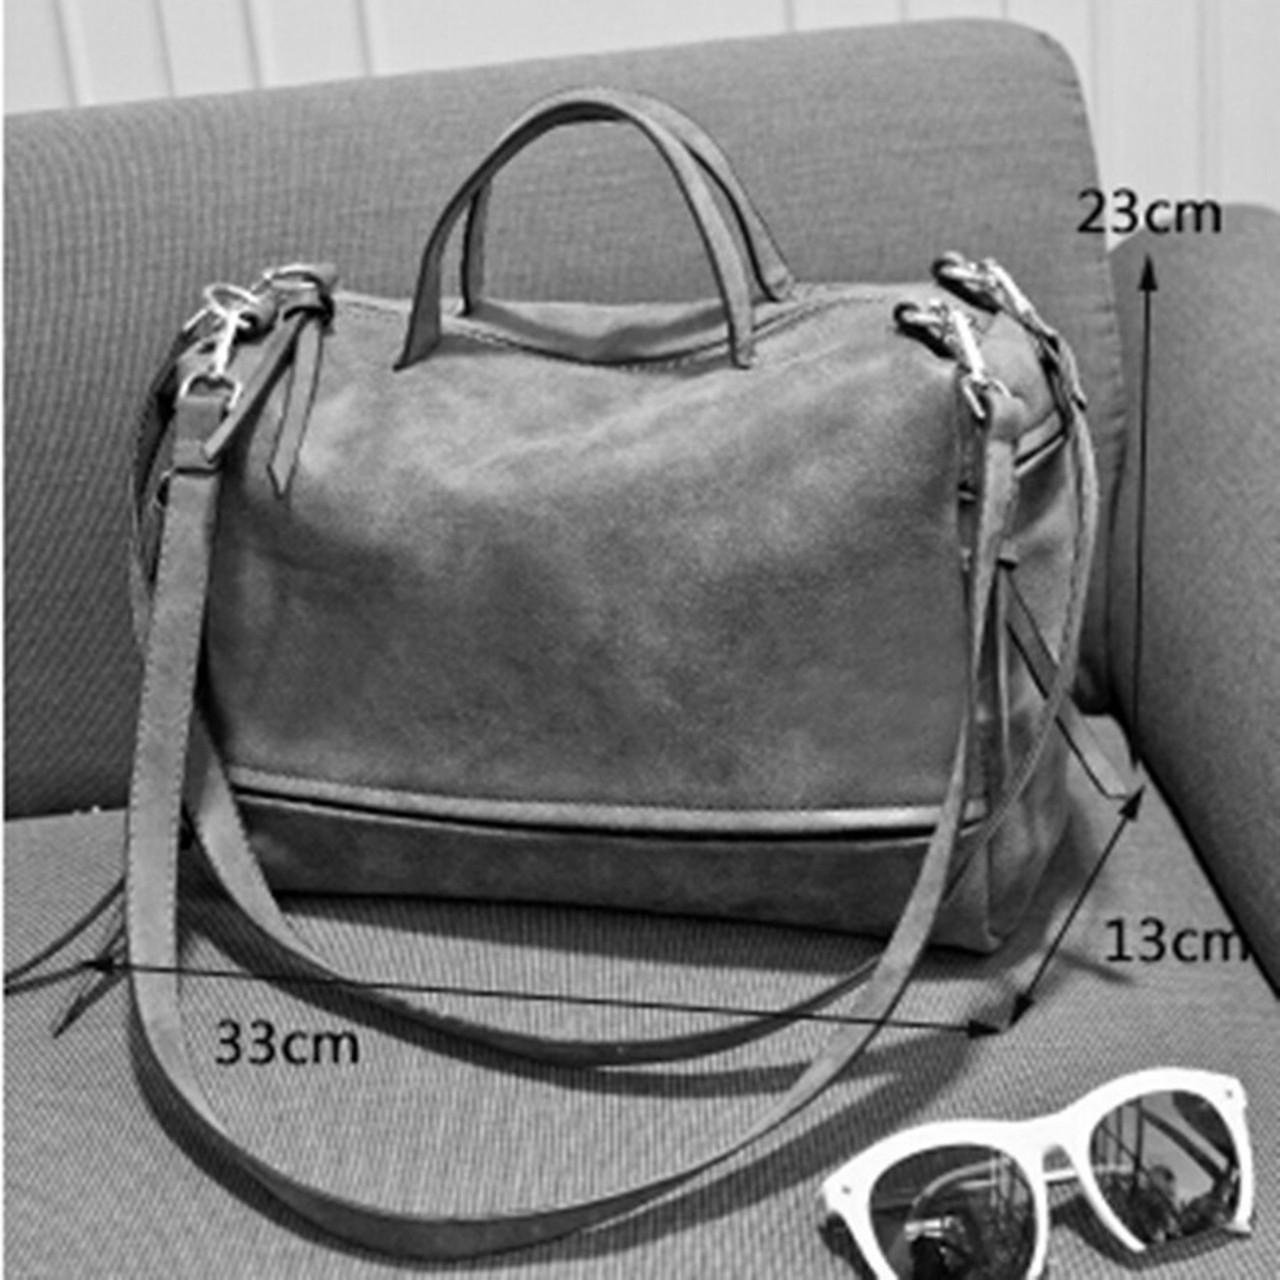 faf482a5c476 ... Bolish Brand Fashion Female Shoulder Bag Nubuck Leather women handbag  Vintage Messenger Bag Motorcycle Crossbody Bags ...